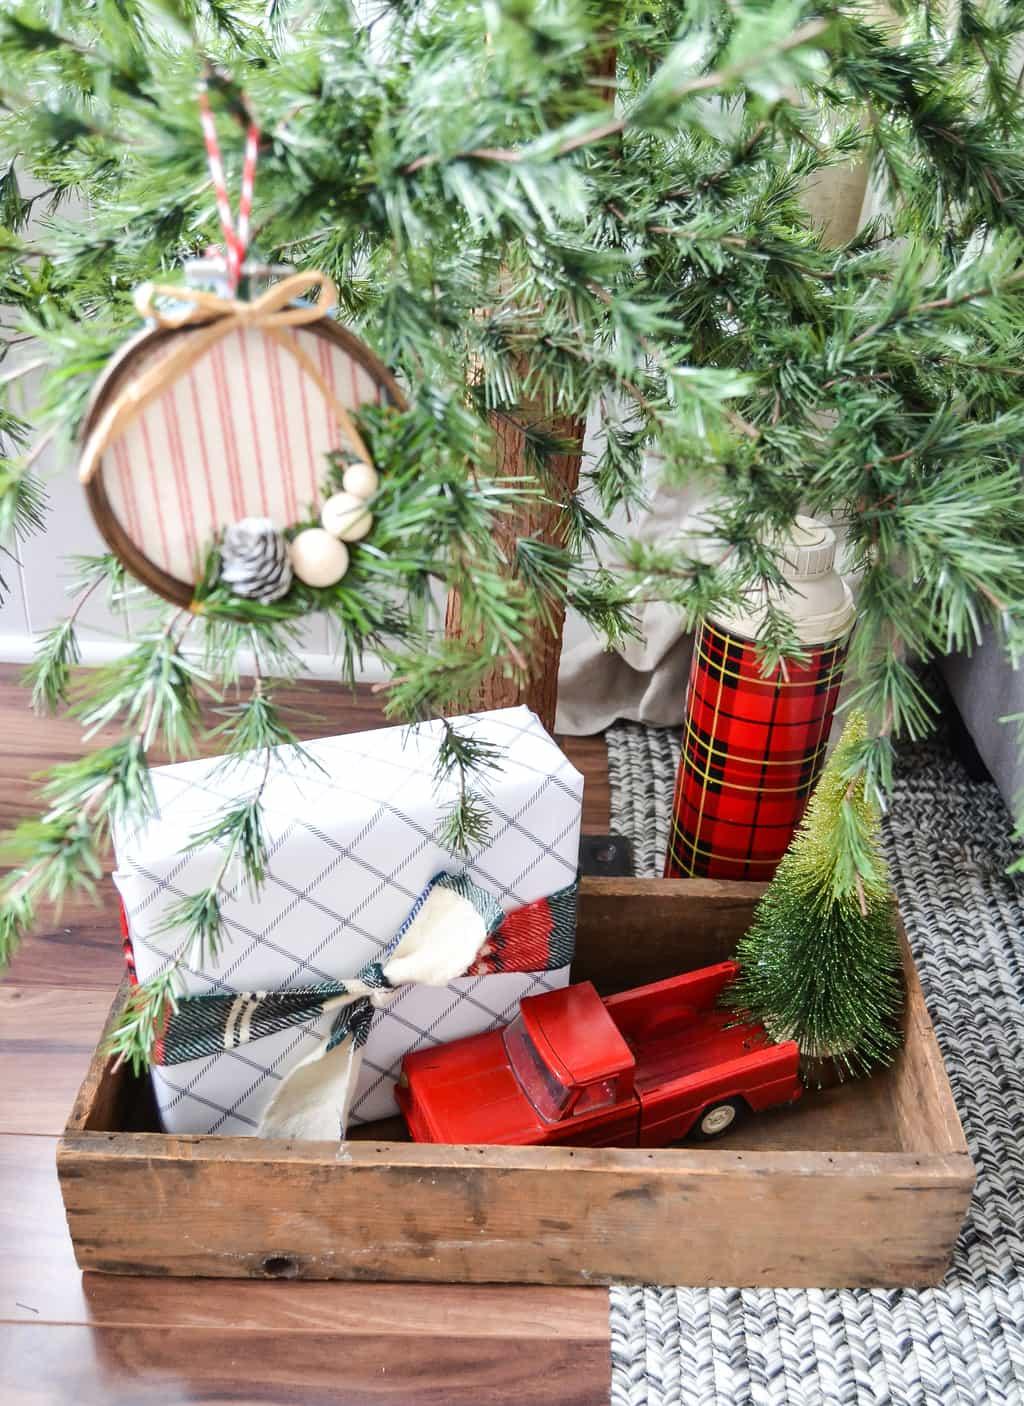 adornos navideños caseros para hacer en casa, precioso adorno DIY, decoración navideña casera, ideas 2018